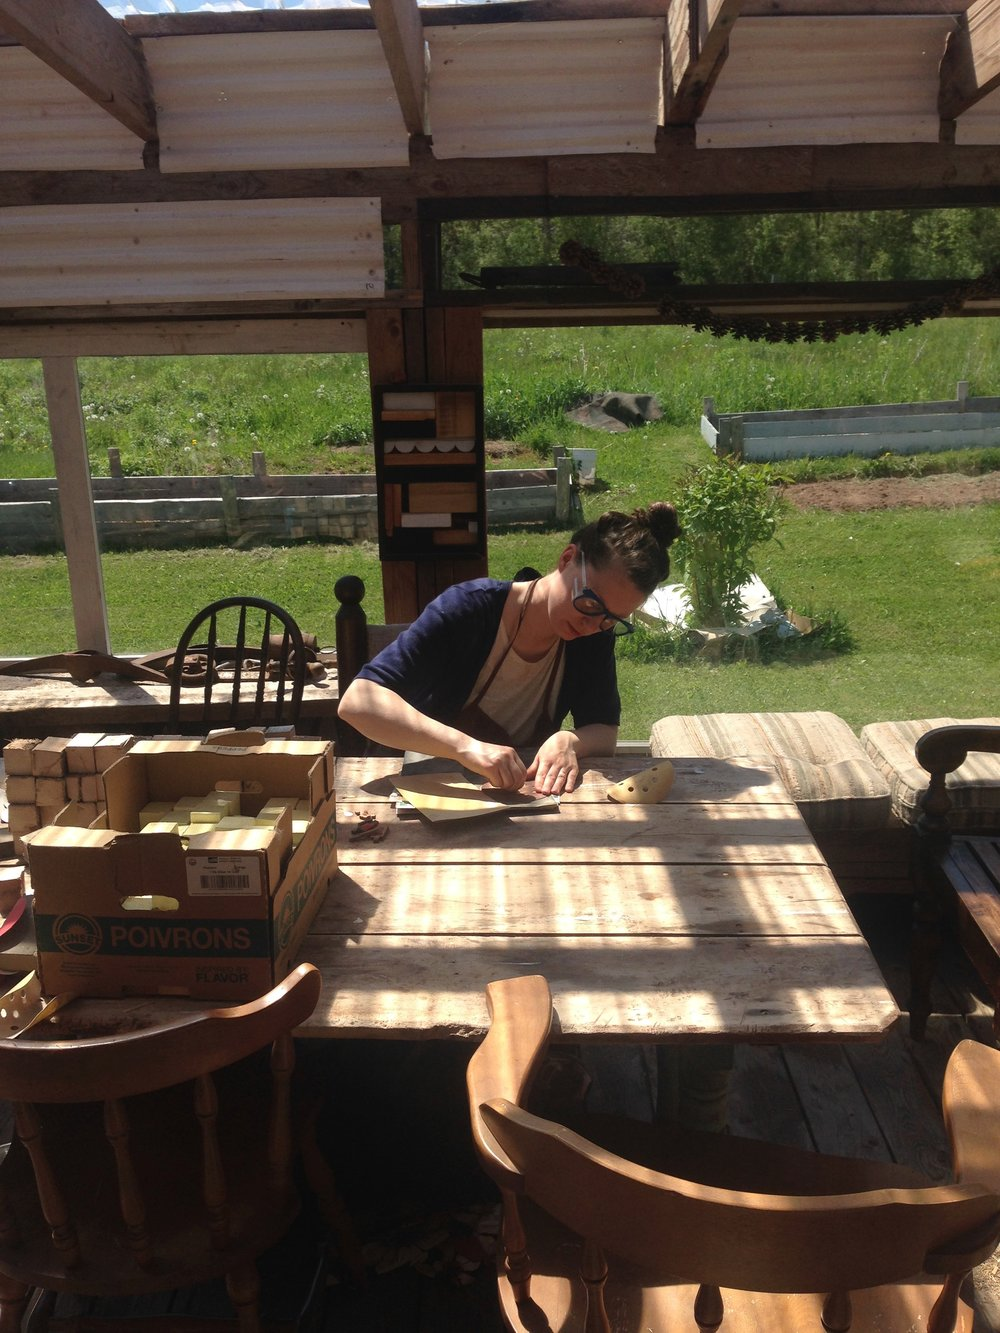 Heather sanding.